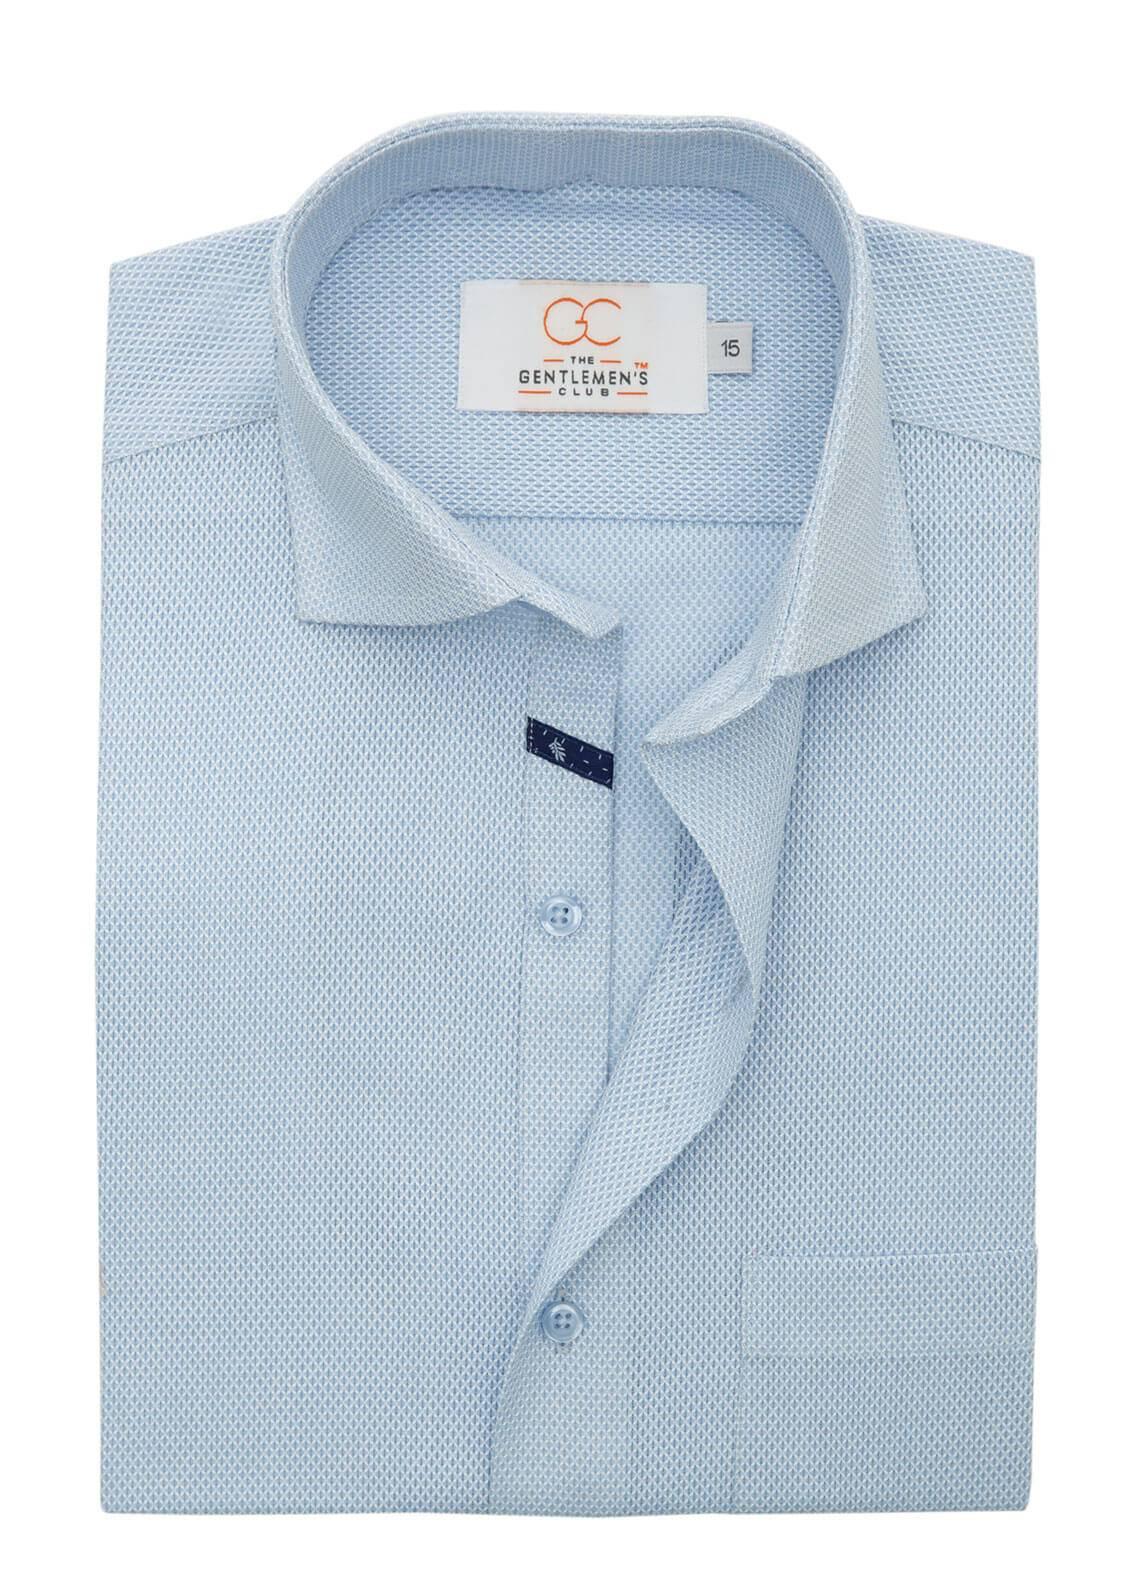 The Gentlemen's Club Cotton Formal Shirts for Men - Sky Blue White Label 4080 - 18